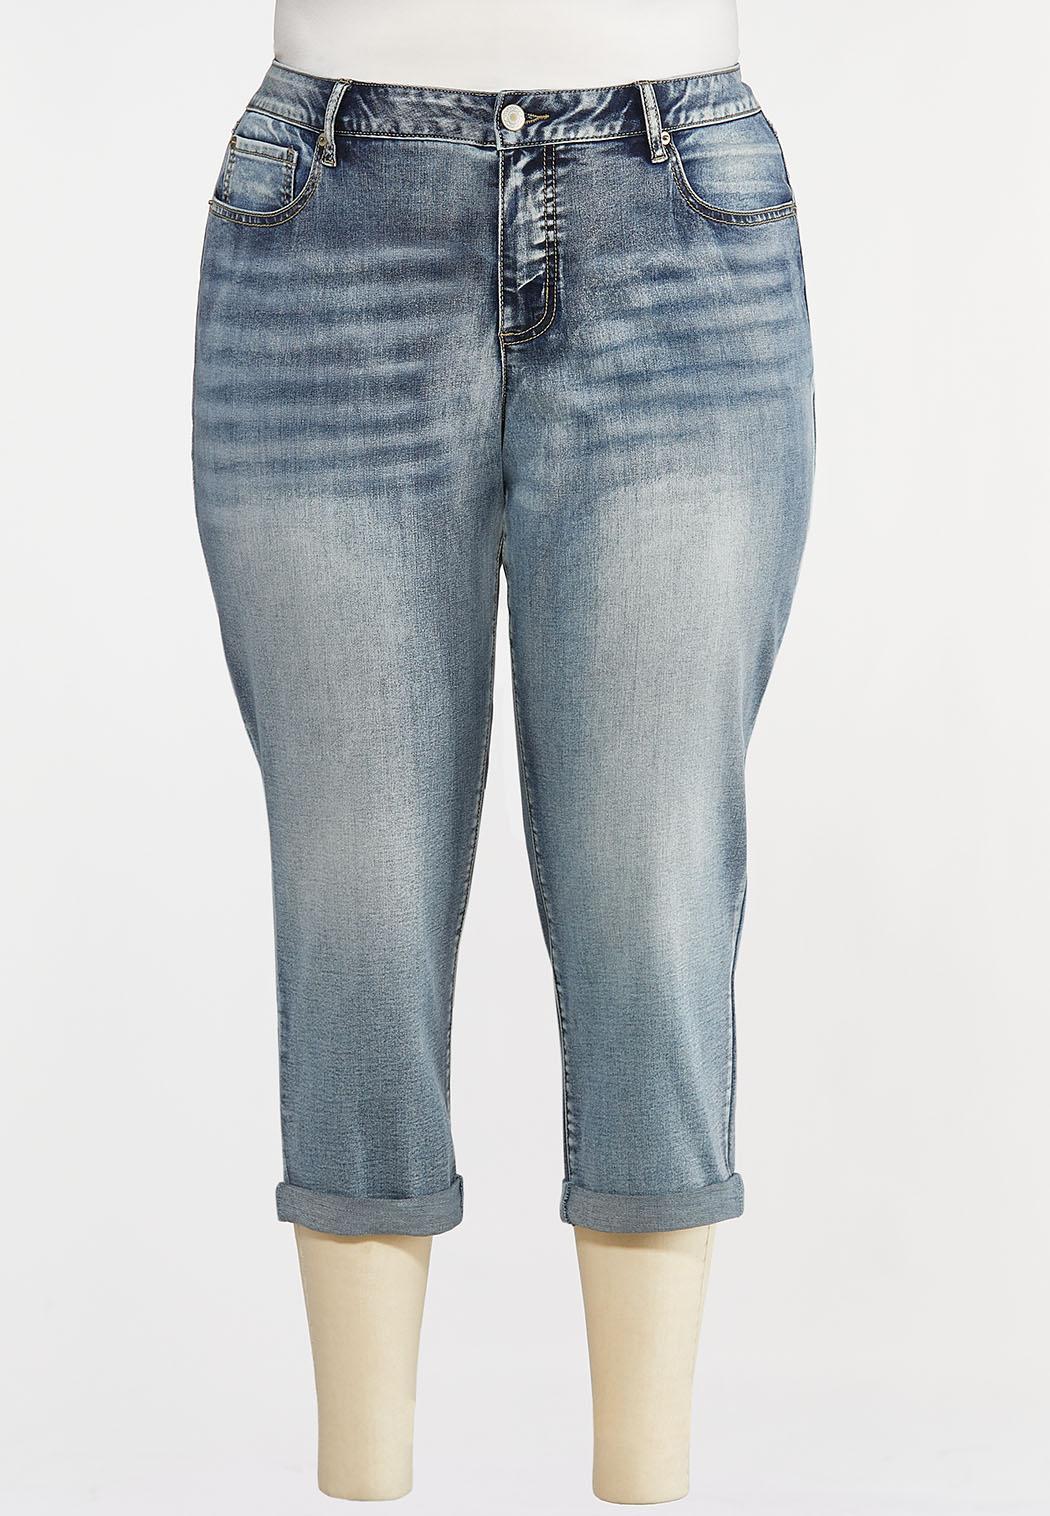 Plus Size Shape Enhancing Cropped Jeans